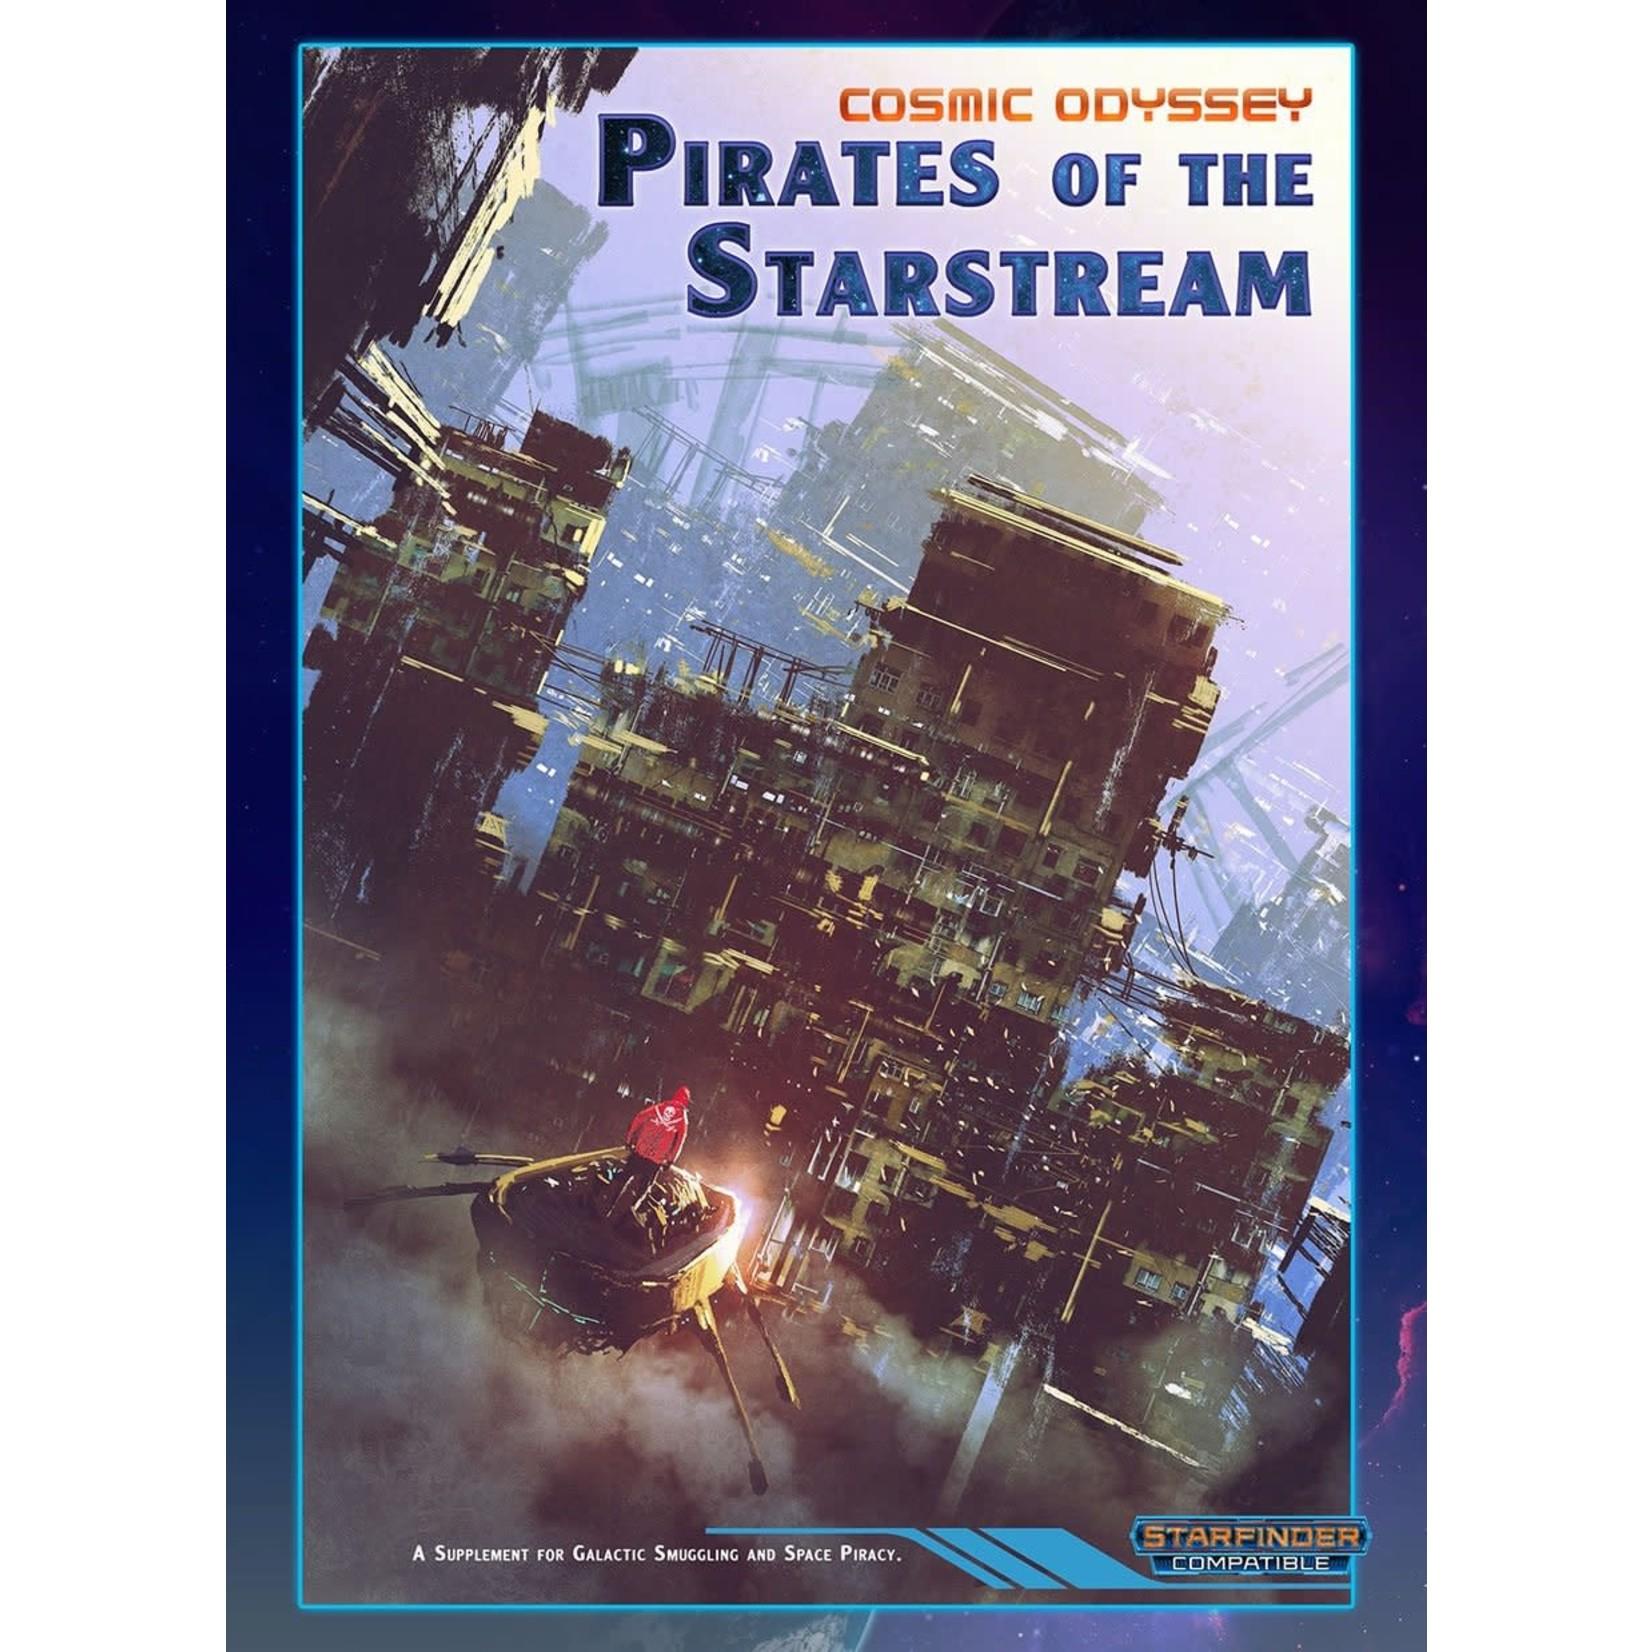 Starfinder RPG Cosmic Odyssey: Pirates of the Starstream